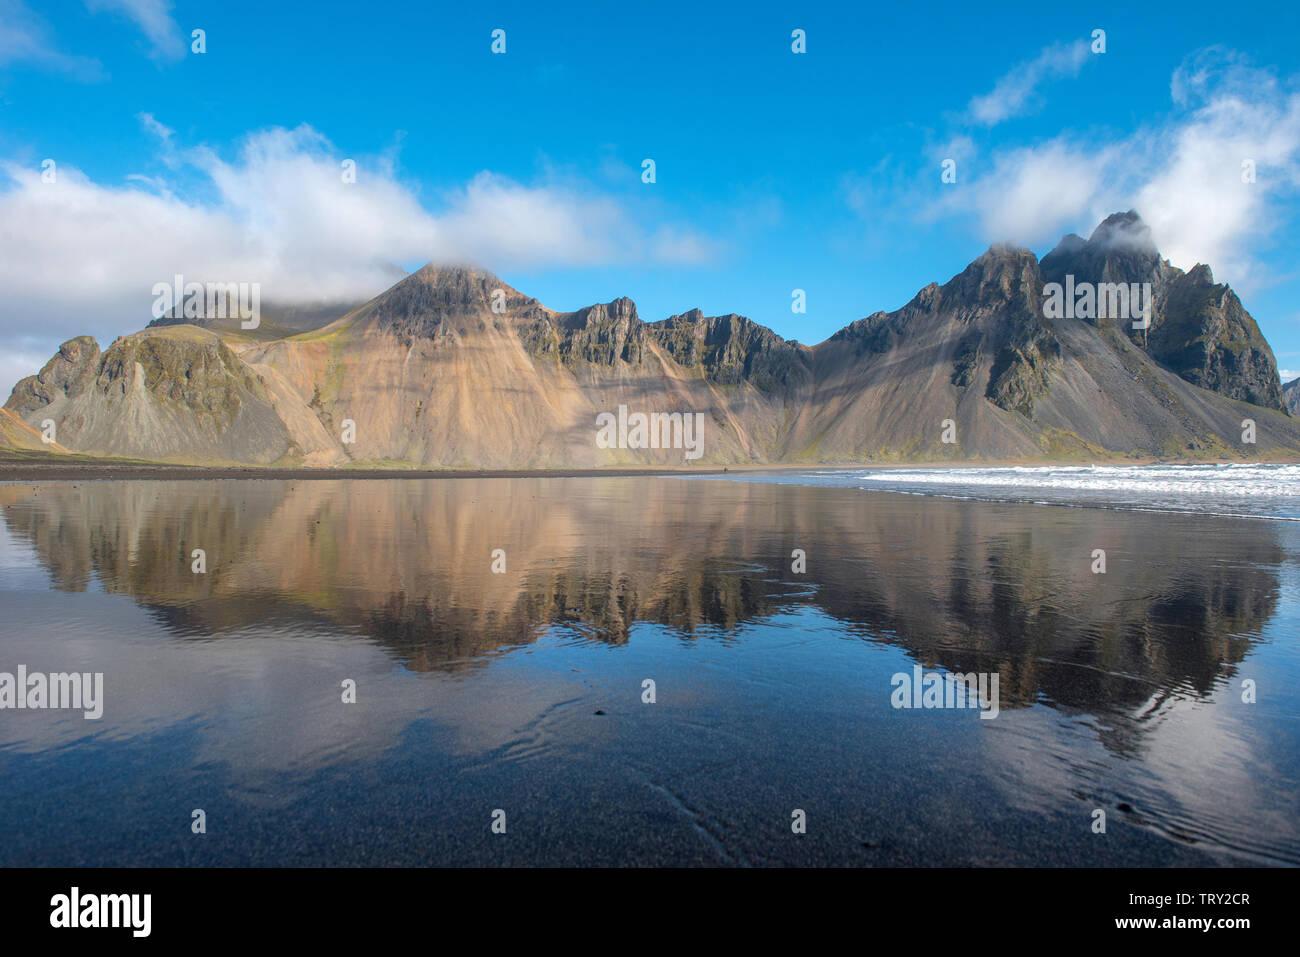 Icelandic landscape, reflection of Vestrahorn mountain in the waters of the Atlantic ocean. Stokksnes peninsula, Hofn, Iceland Stock Photo